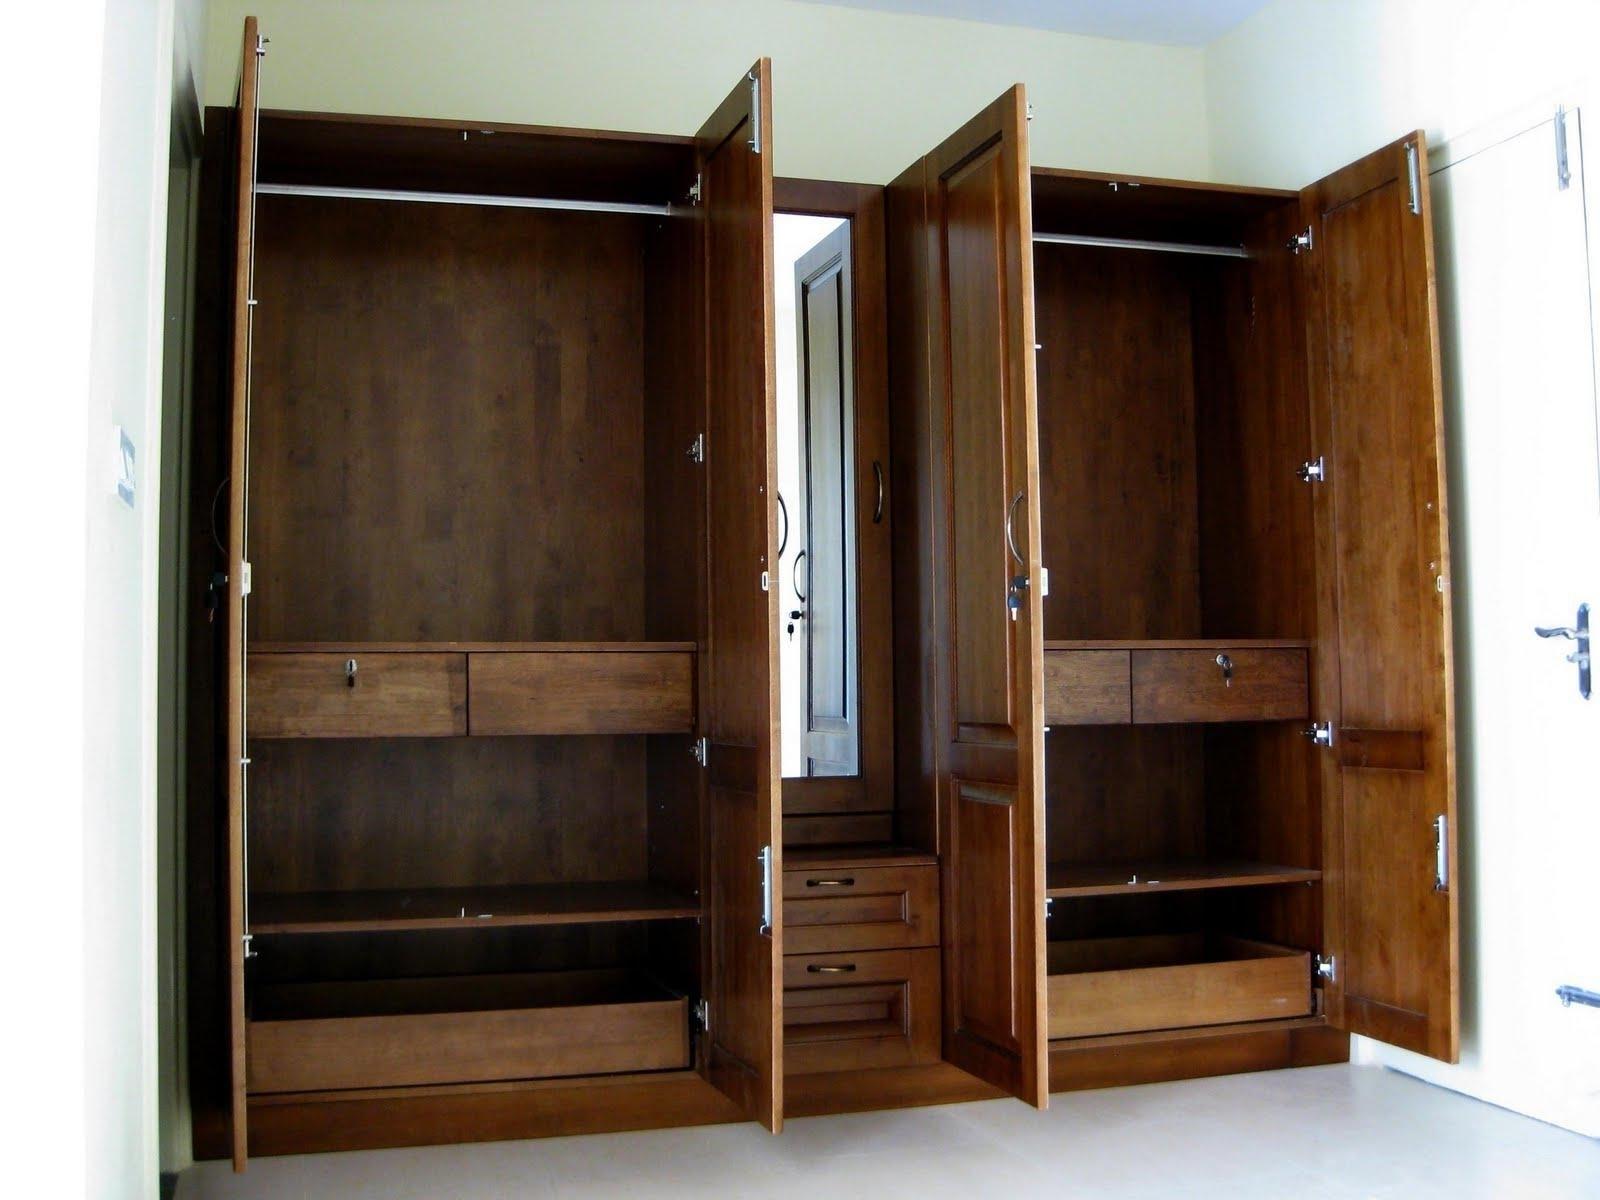 Exquisite Brilliant Design Cheap Wooden Wardrobes 0452601 Pe601520 In Favorite Cheap Wooden Wardrobes (View 7 of 15)